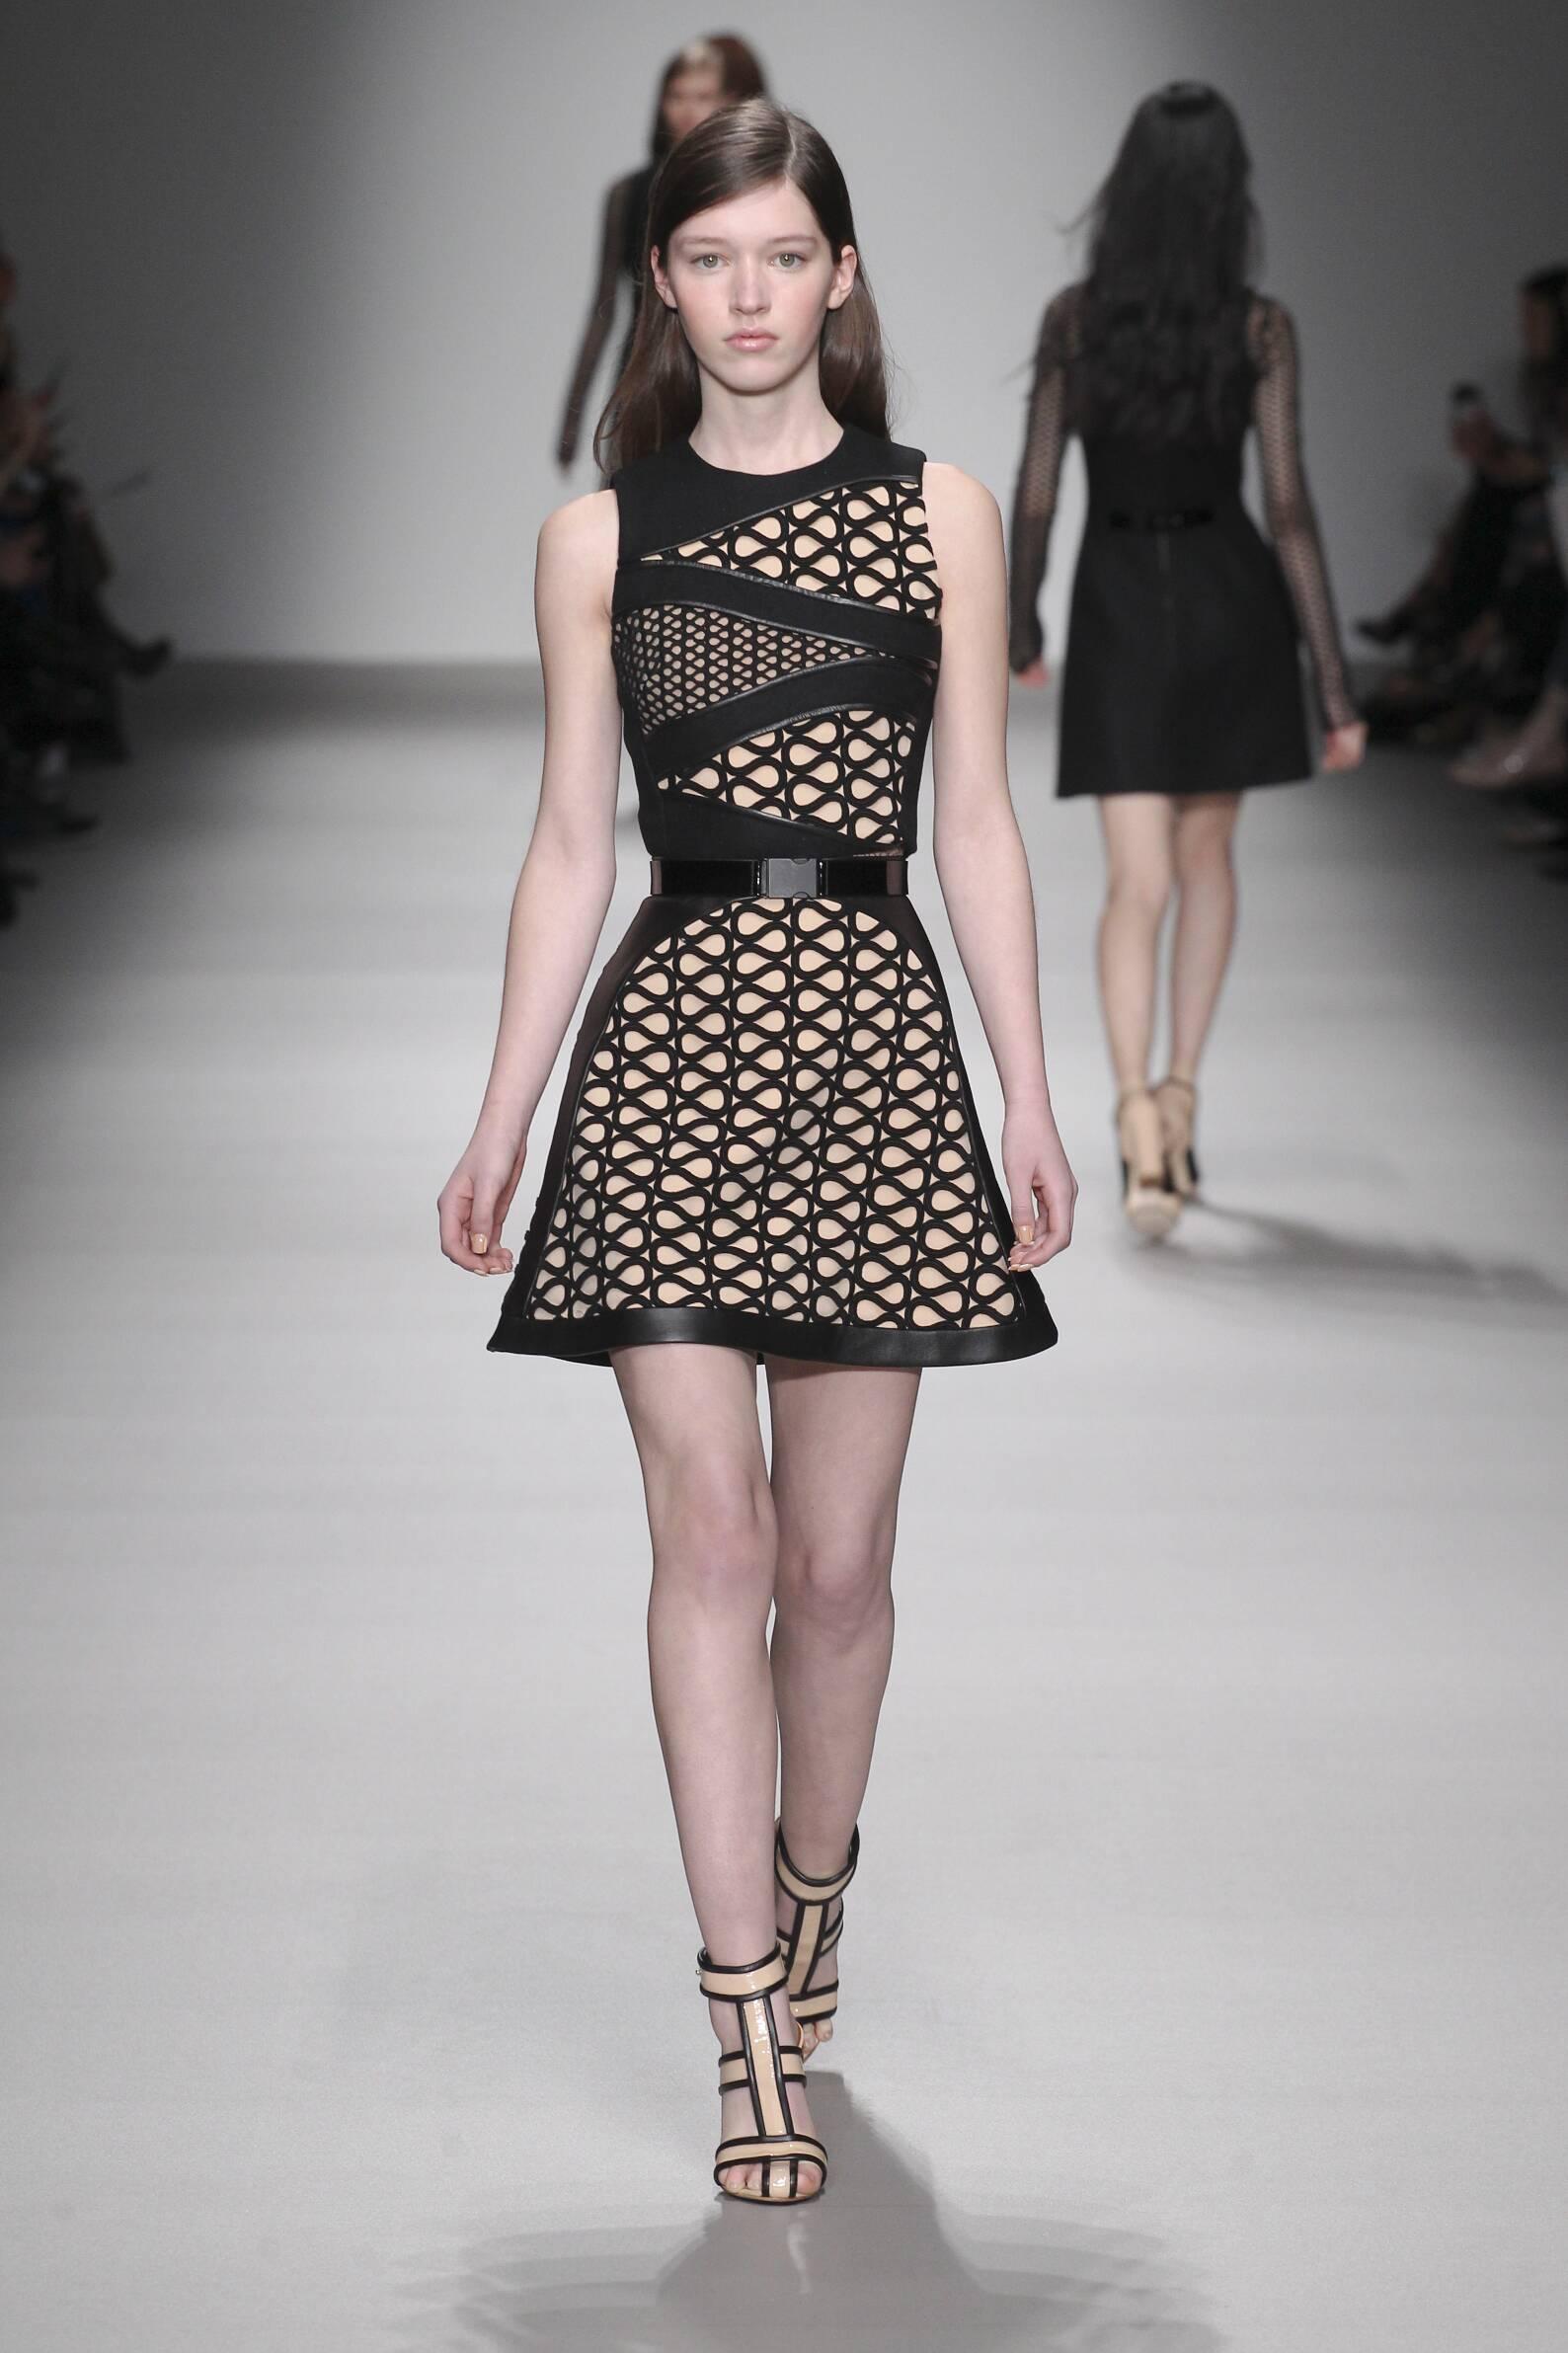 Catwalk David Koma Womenswear Collection Winter 2015